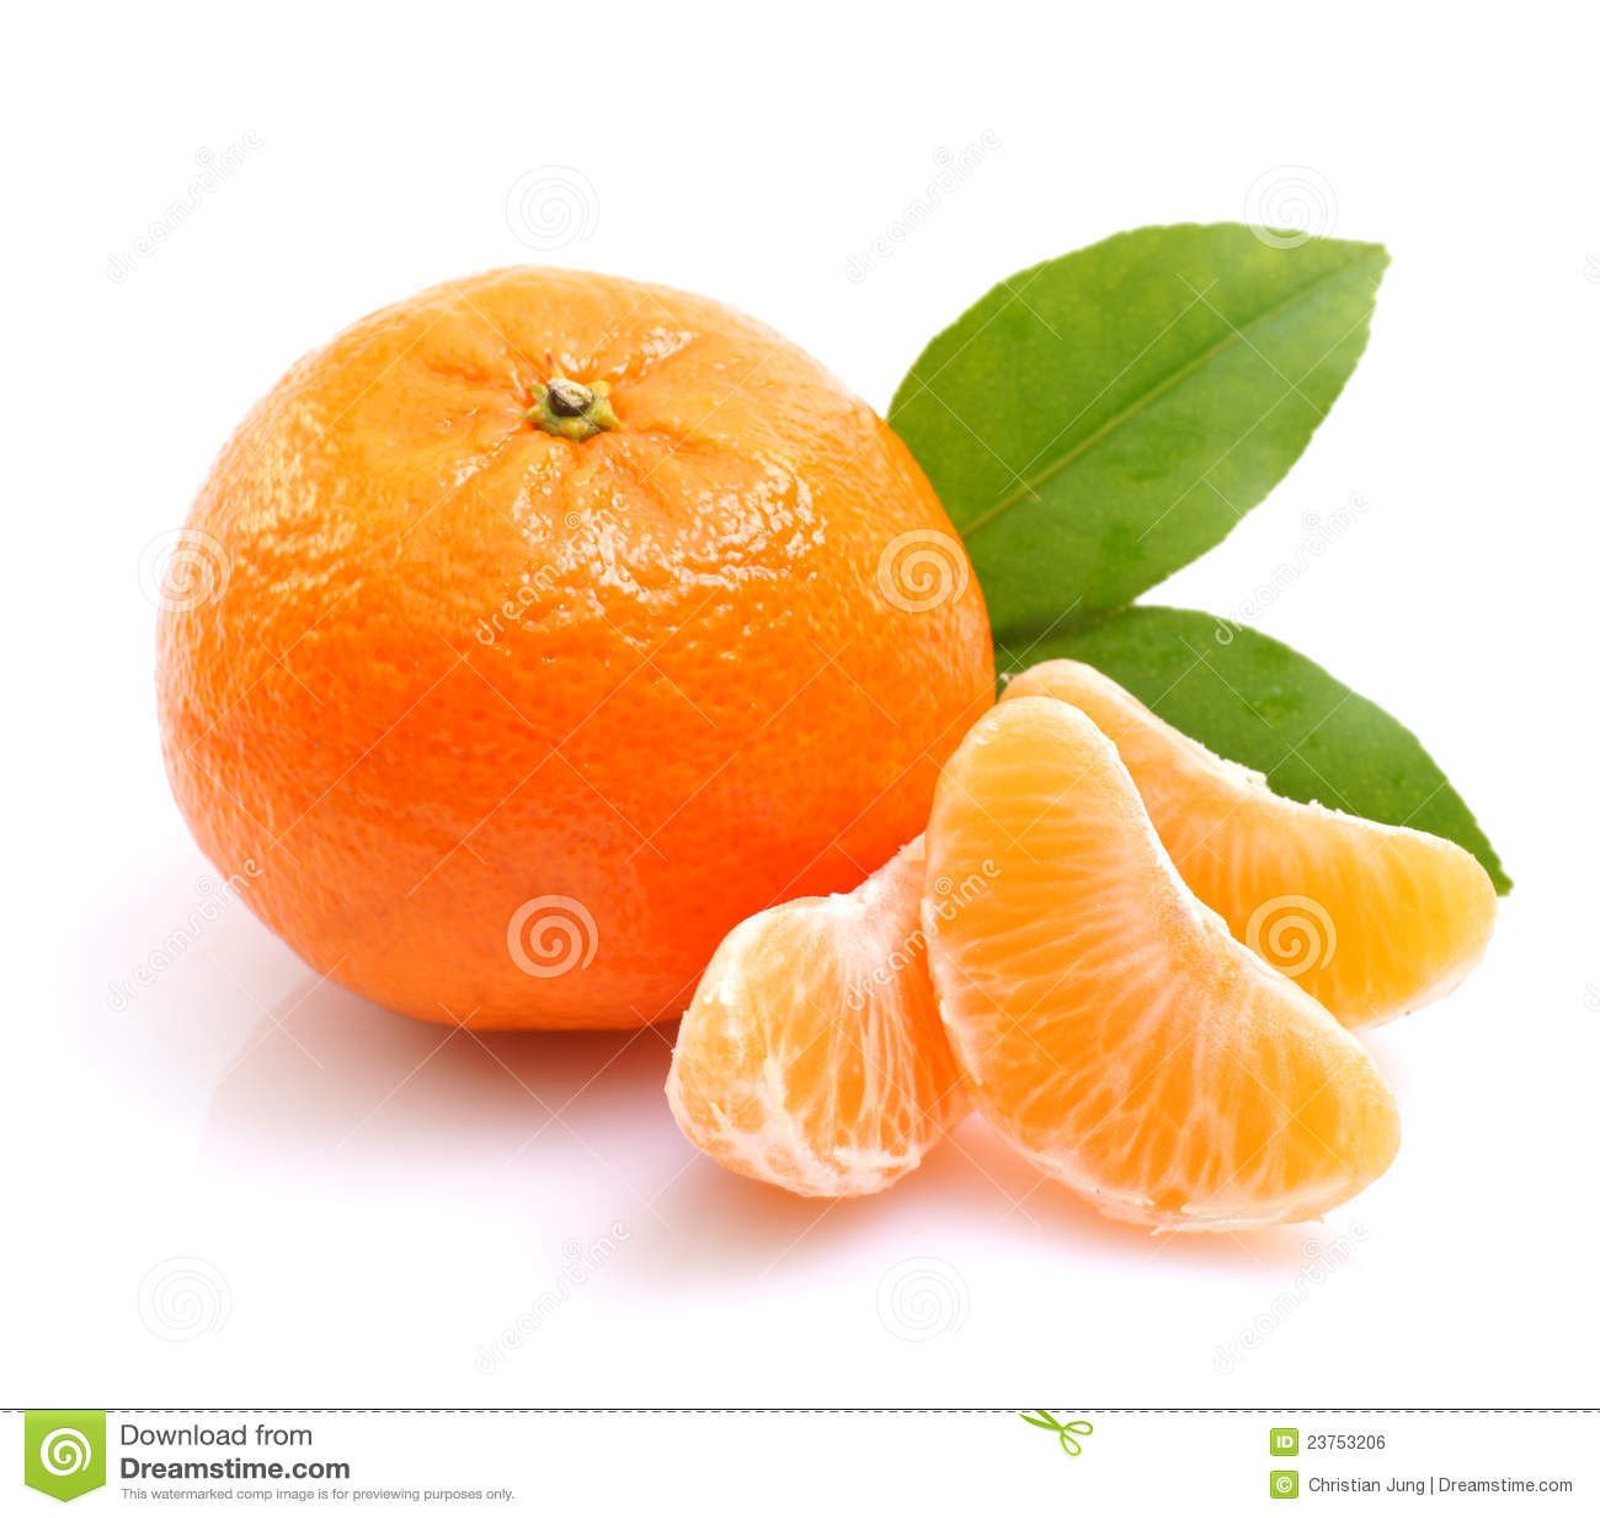 mandarin orange stock photo image of citrus tangerine 23753206. Black Bedroom Furniture Sets. Home Design Ideas